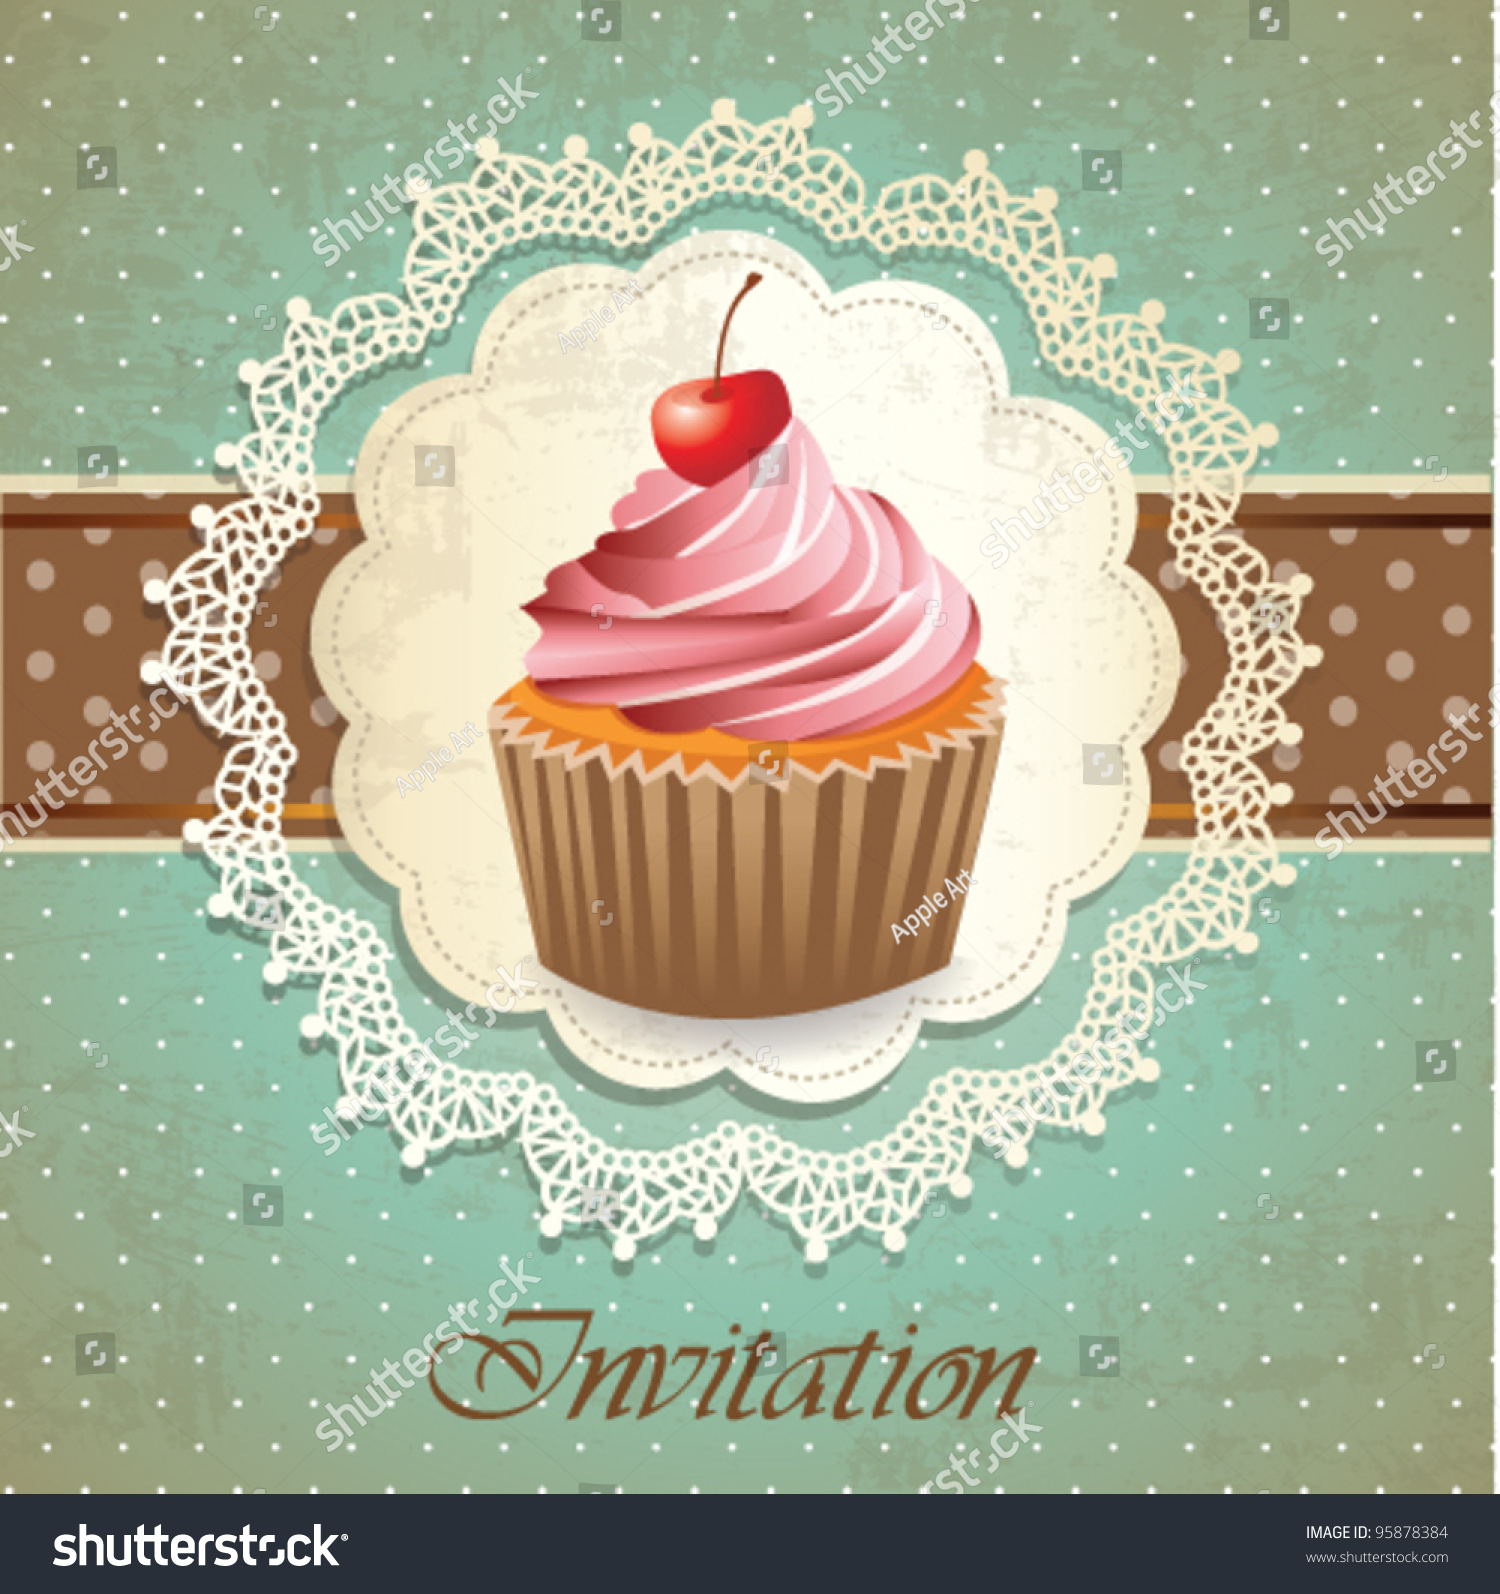 Cake Packaging Design Vector : Vintage Cupcake Illustration www.imgkid.com - The Image ...